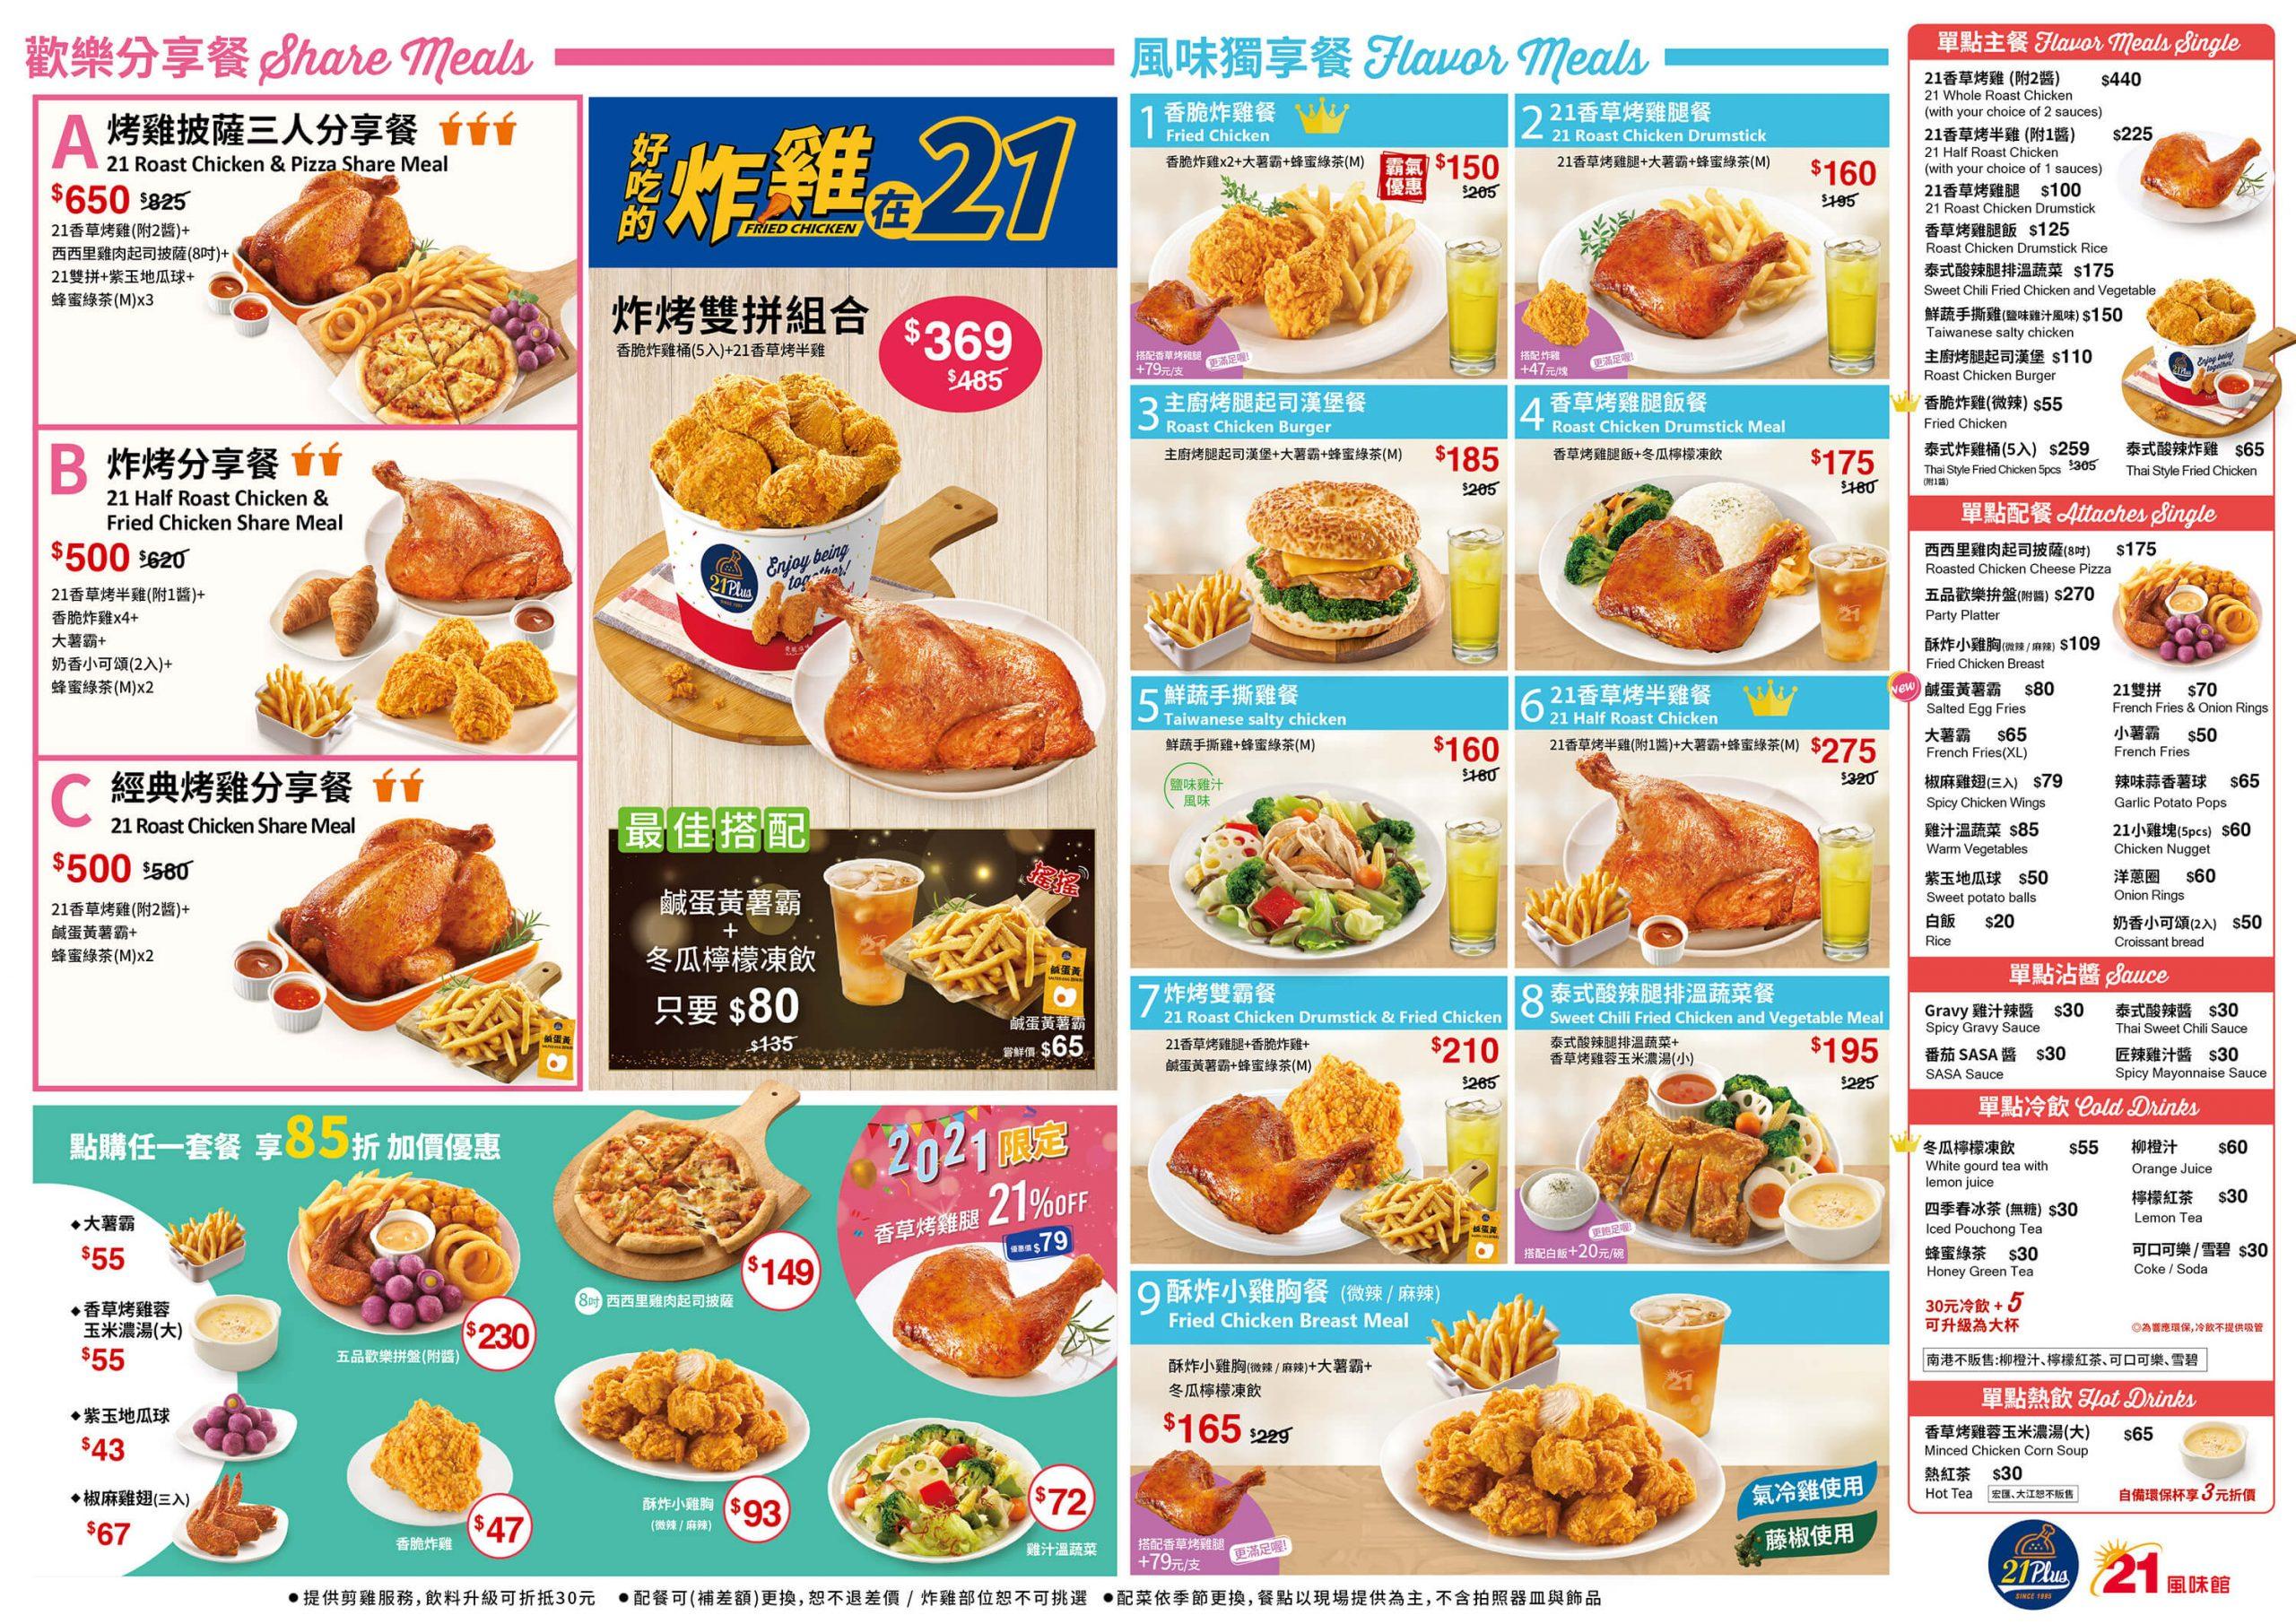 21PLUS、21風味館全門市菜單MENU